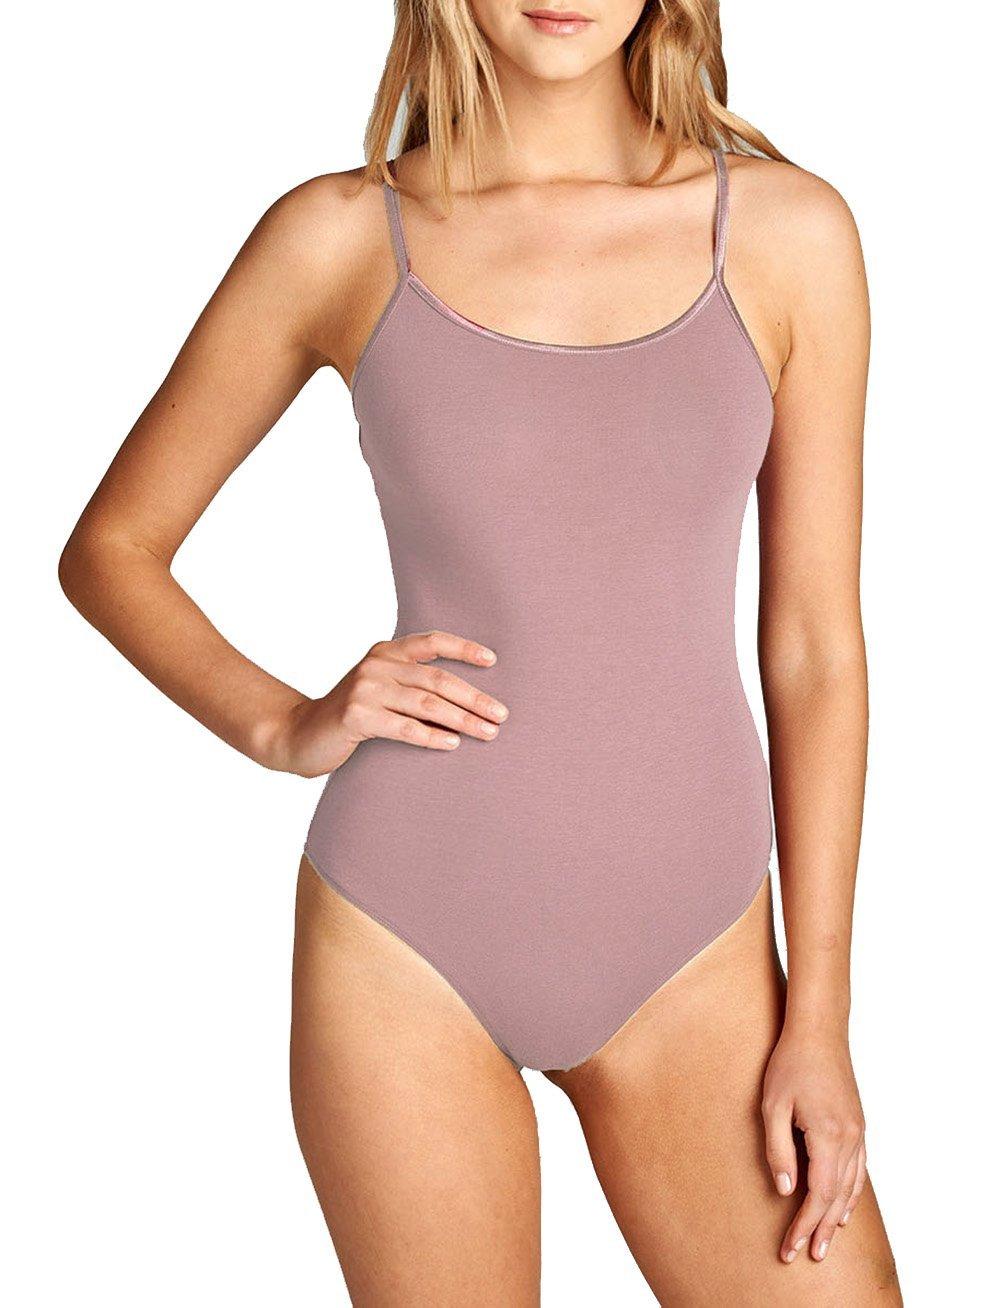 Snap Crotch Thin Strap Leotard Bodysuit Camisole Bodysuit Camisole T9748